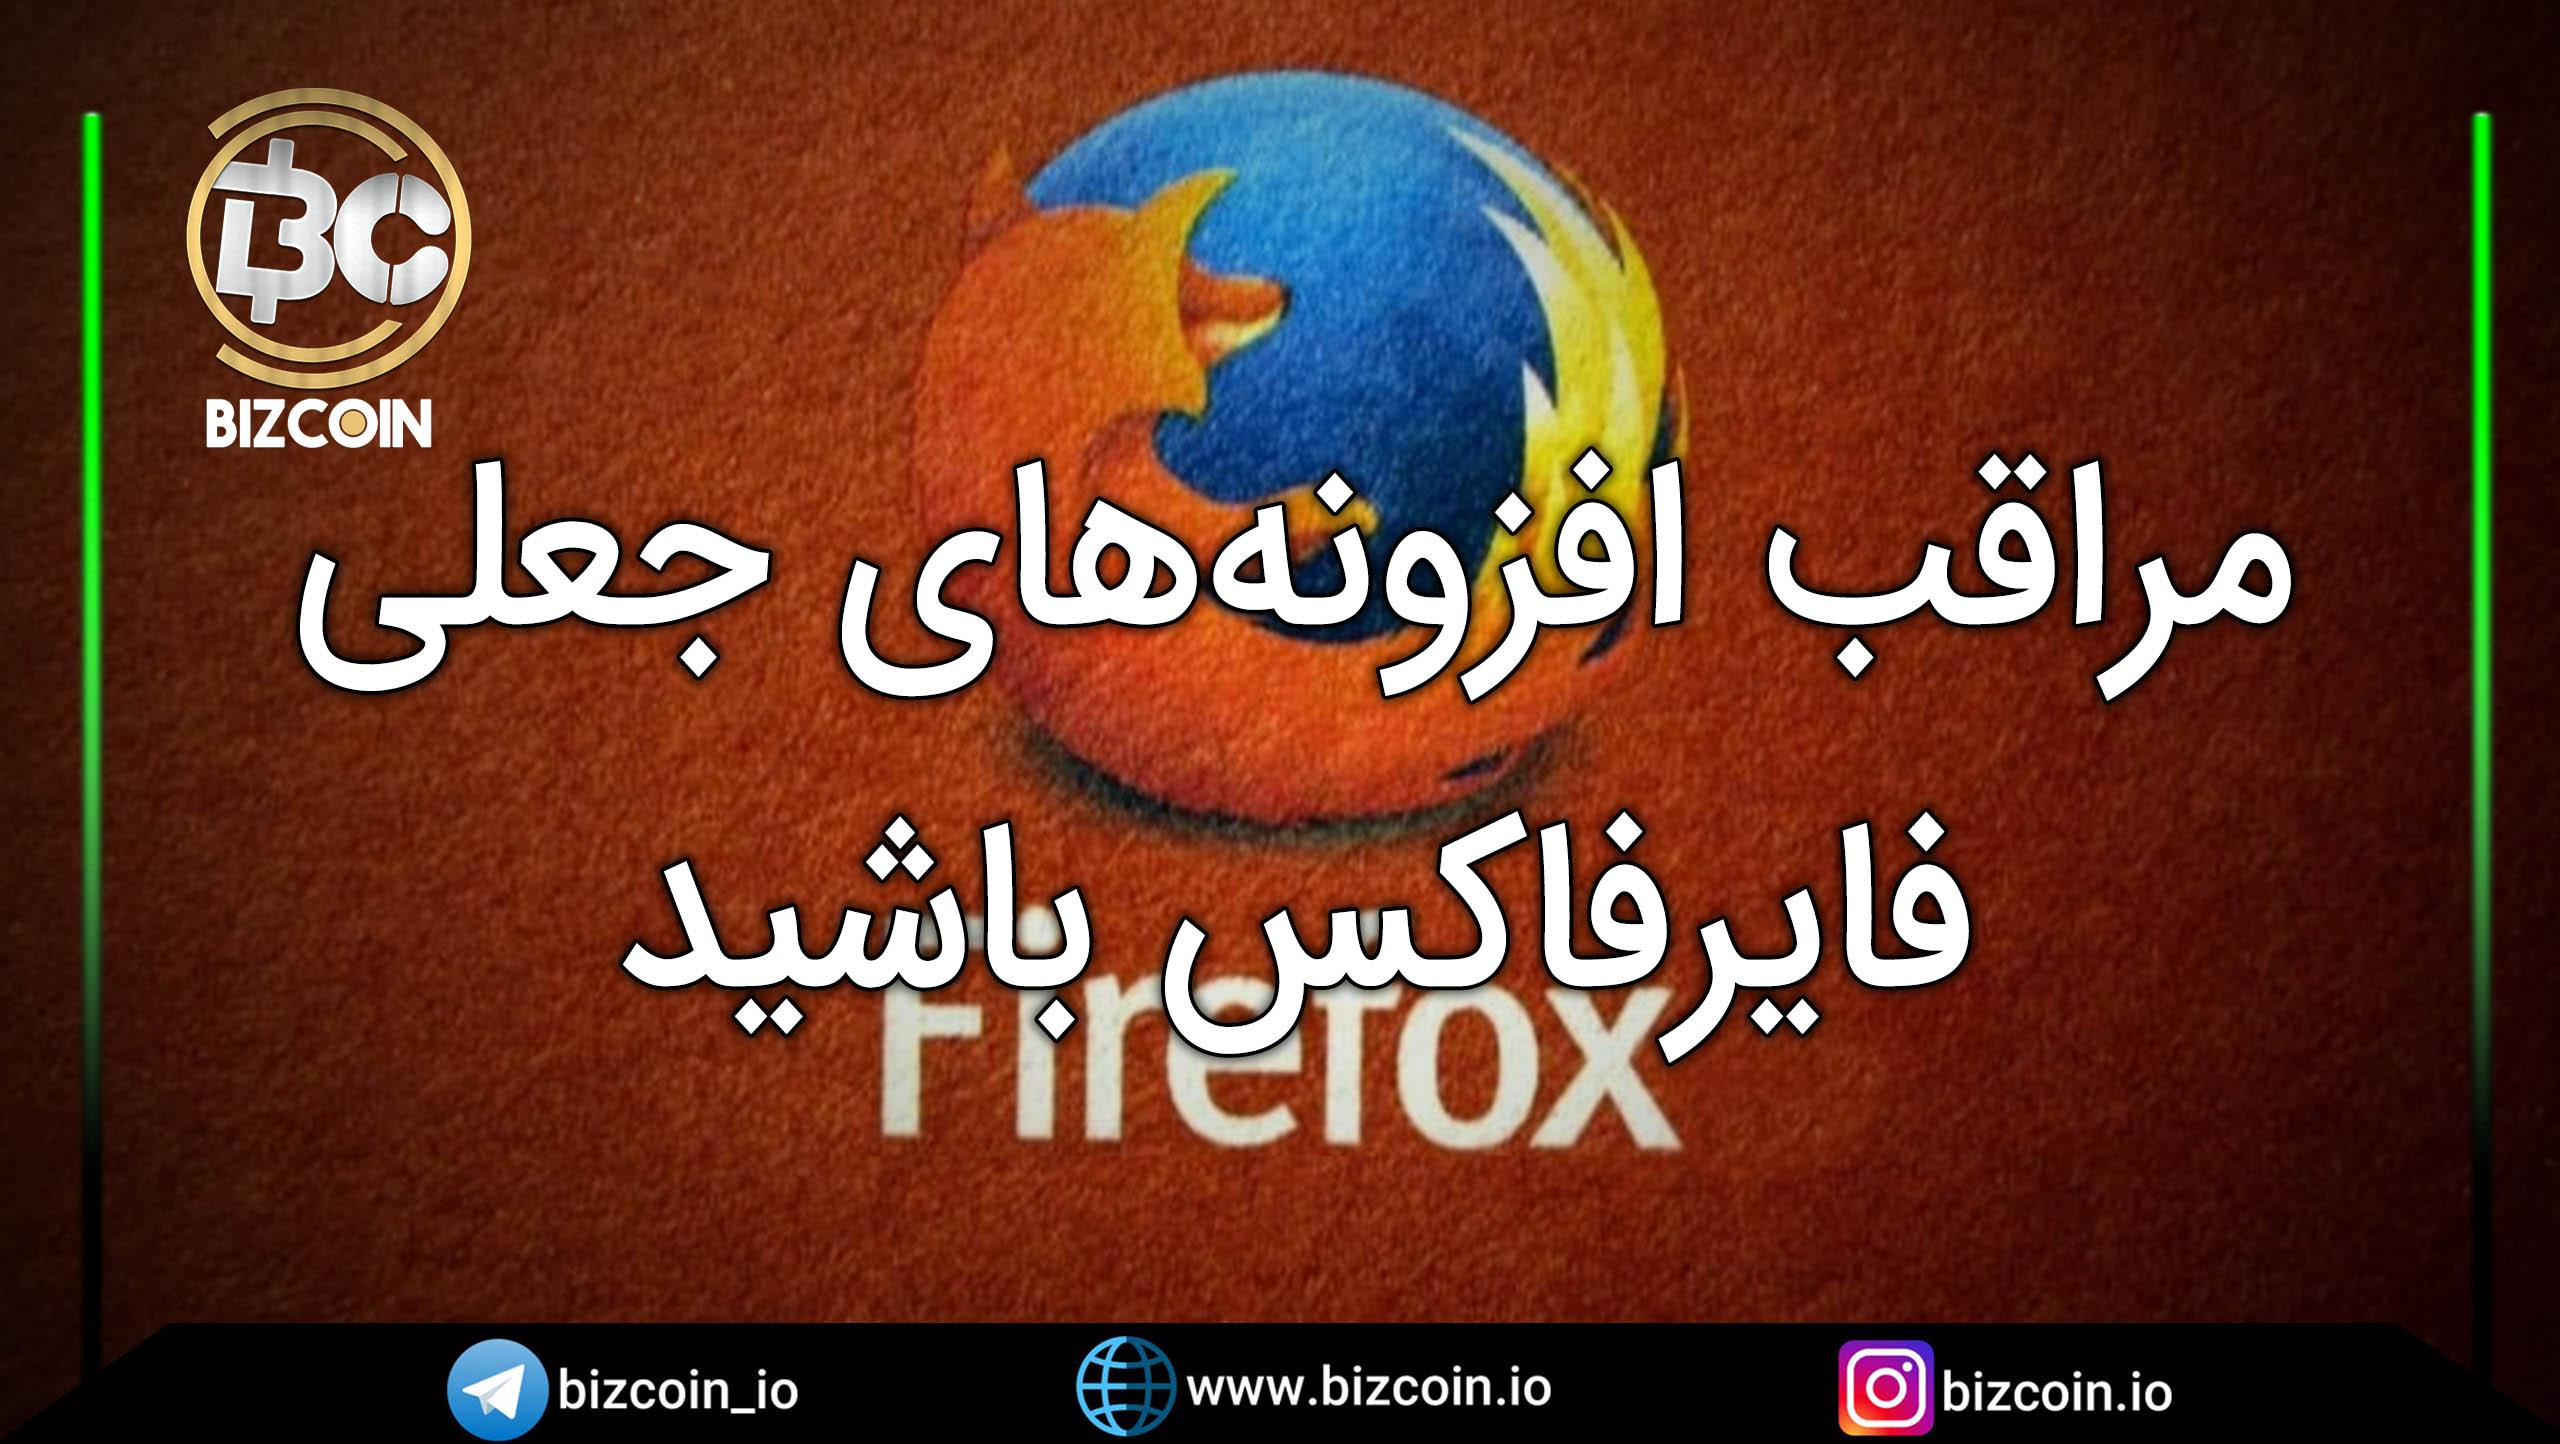 Beware of fake Firefox plugins مراقب افزونههای جعلی فایرفاکس باشید